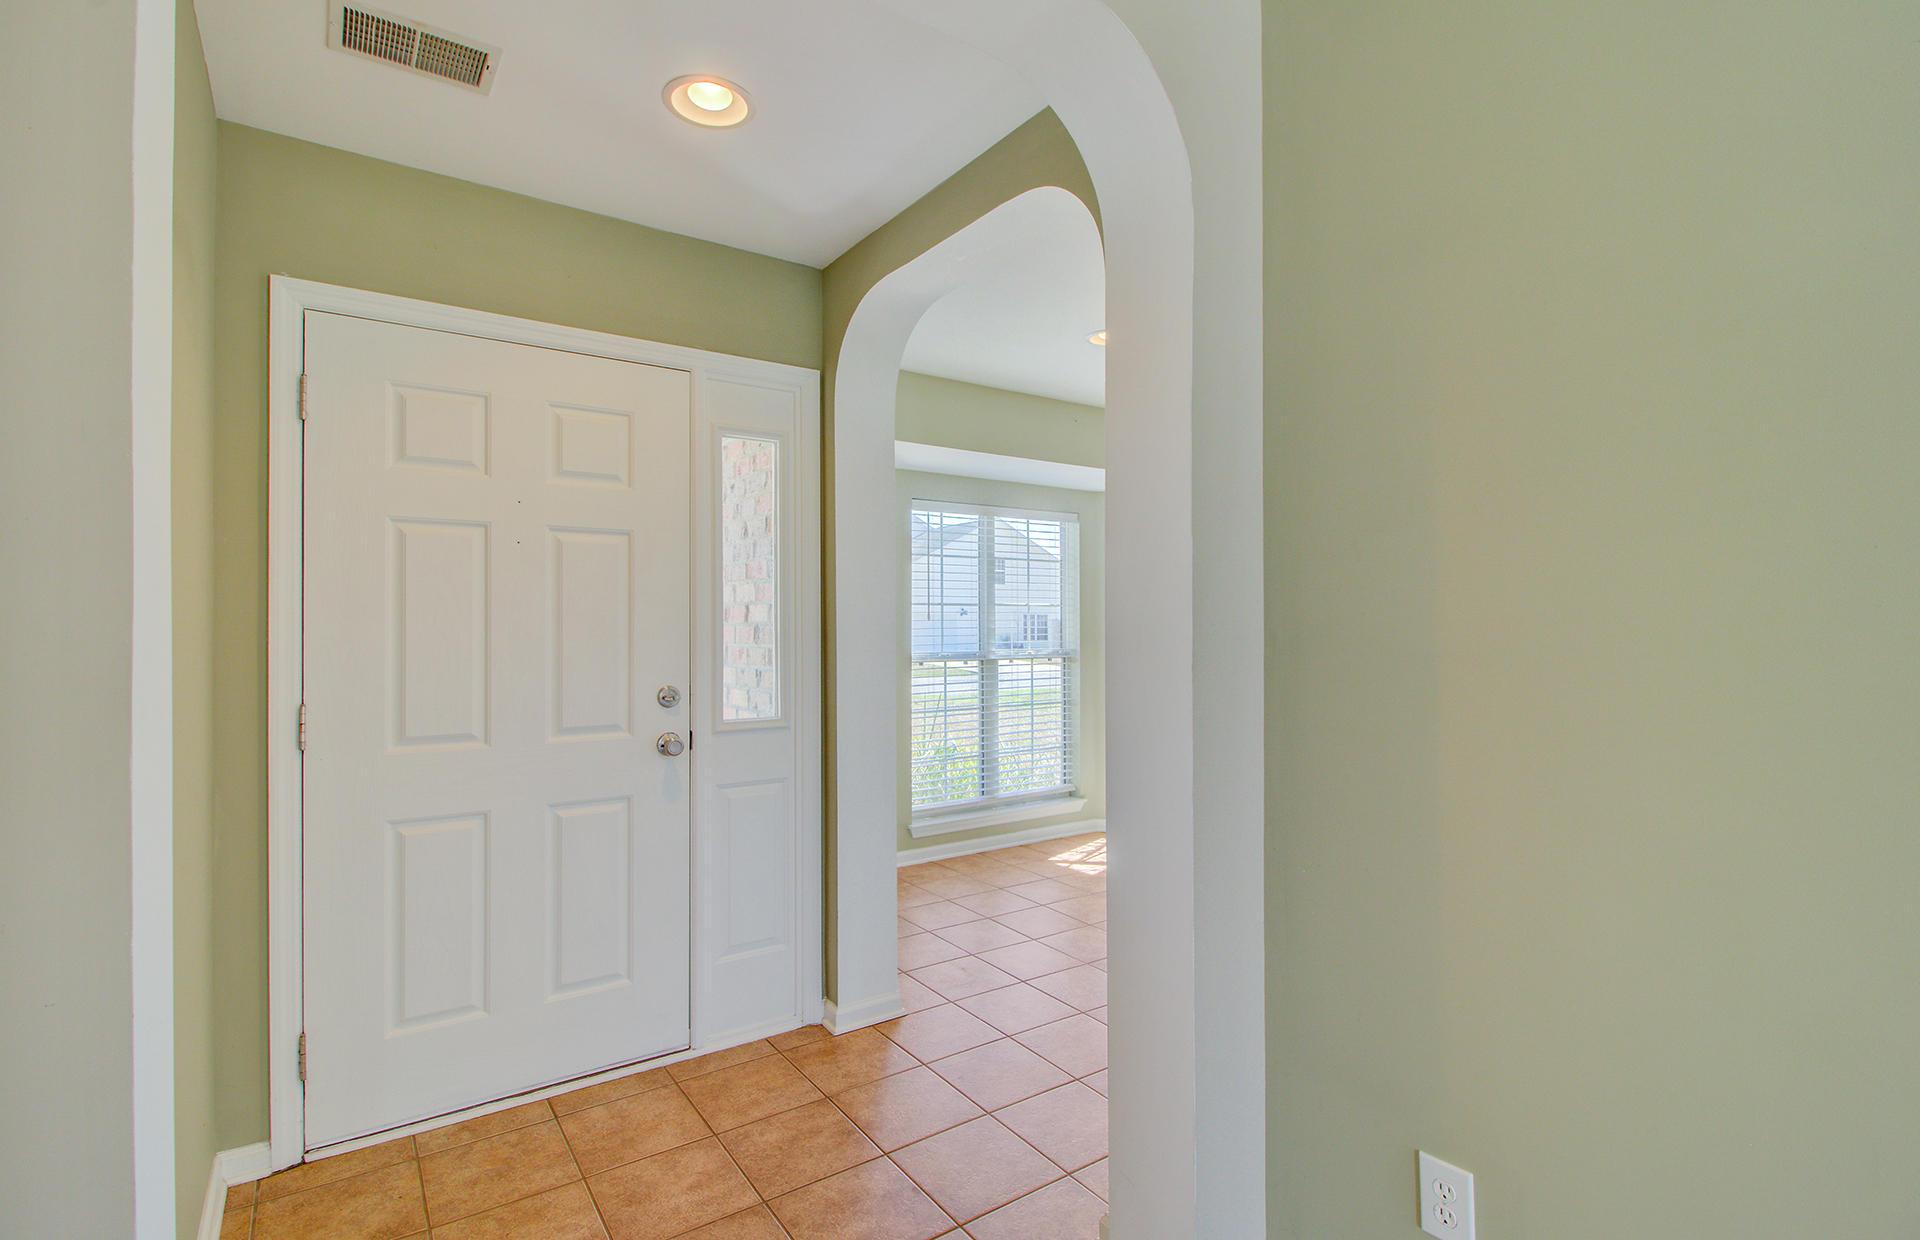 Grand Oaks Plantation Homes For Sale - 789 Bent Hickory, Charleston, SC - 4